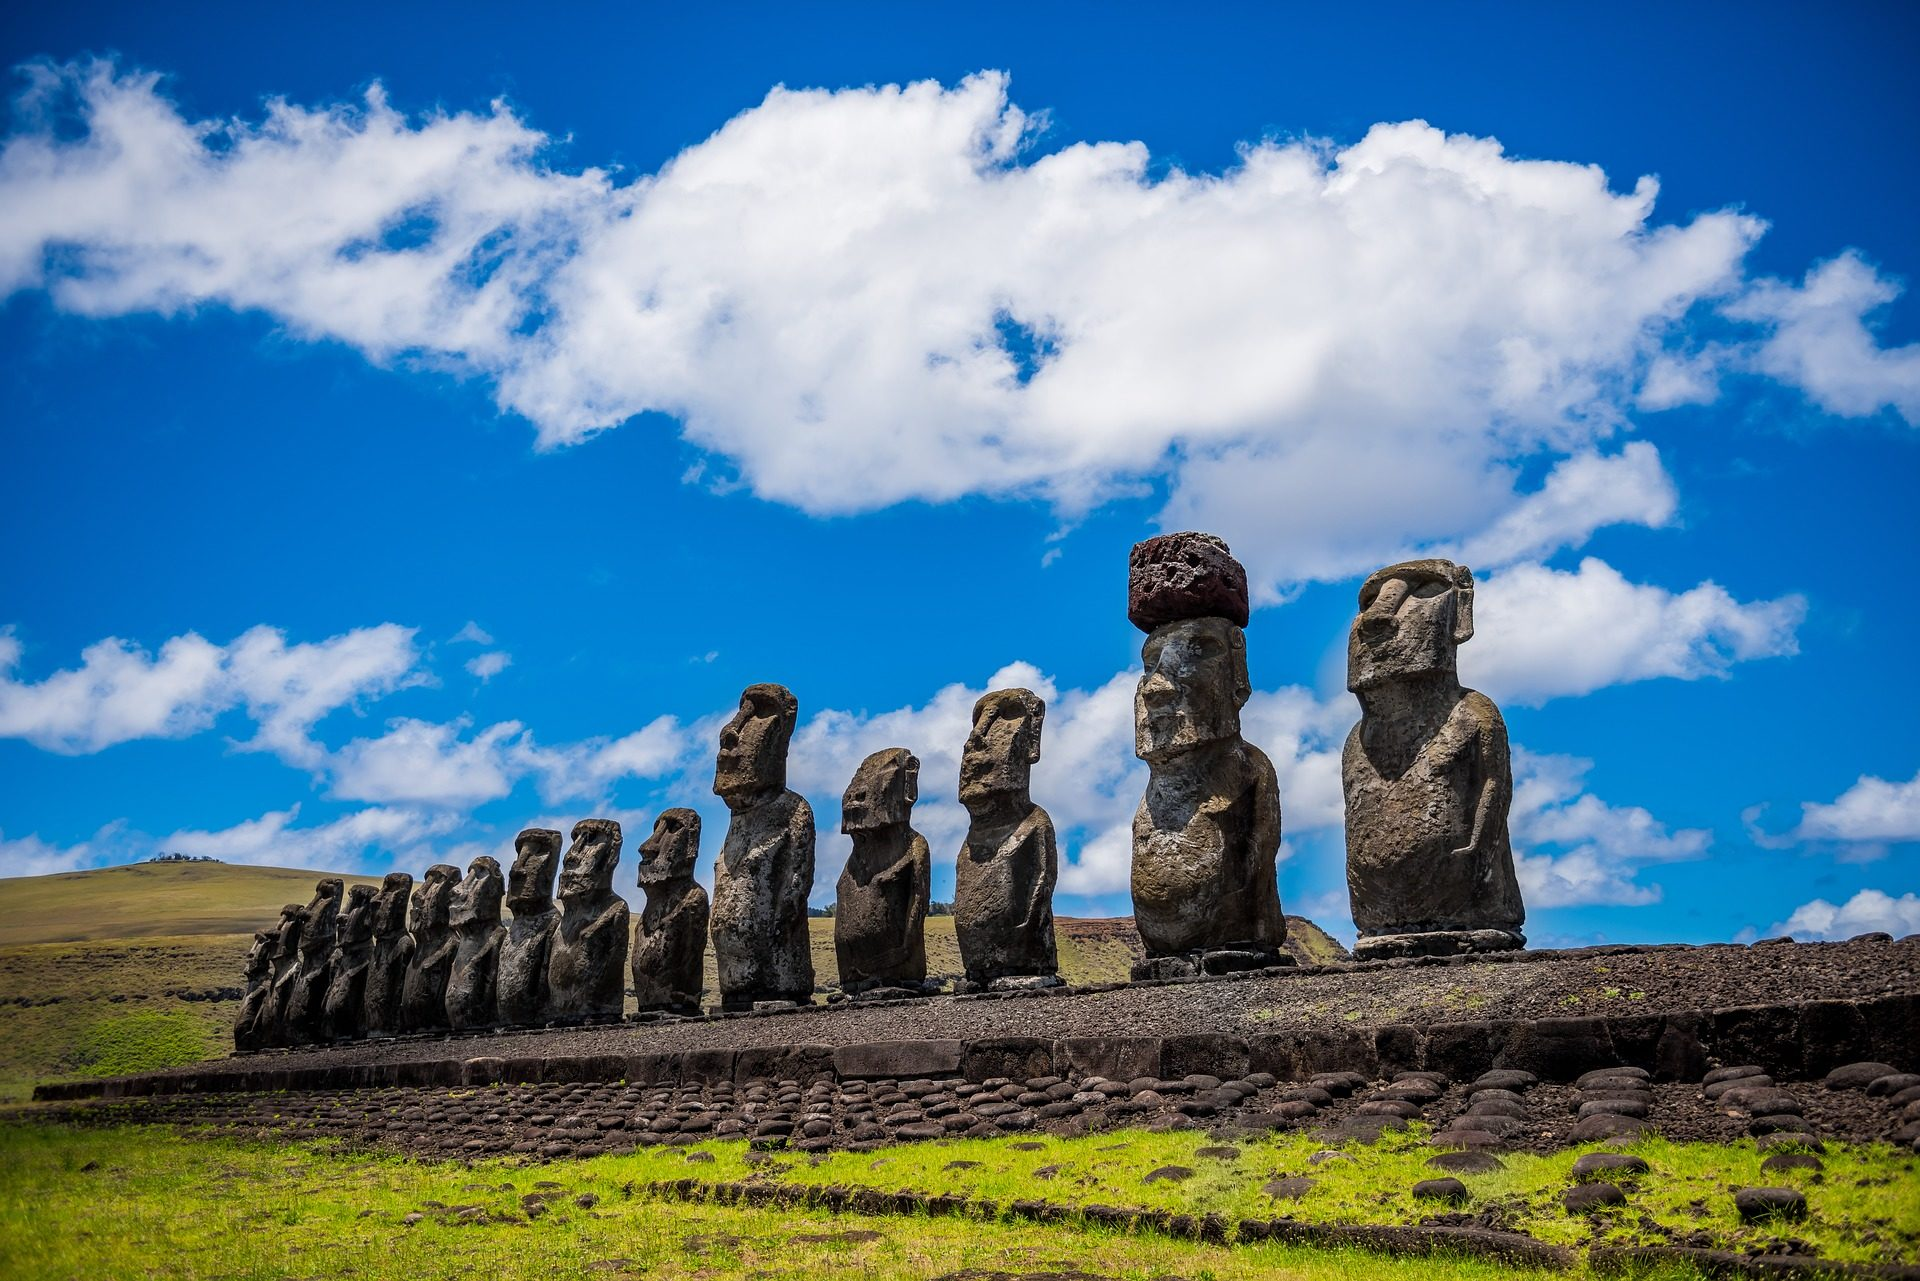 Île de Pâques, Rapa nui, totems, statues, sculptures, ancêtres - Fonds d'écran HD - Professor-falken.com